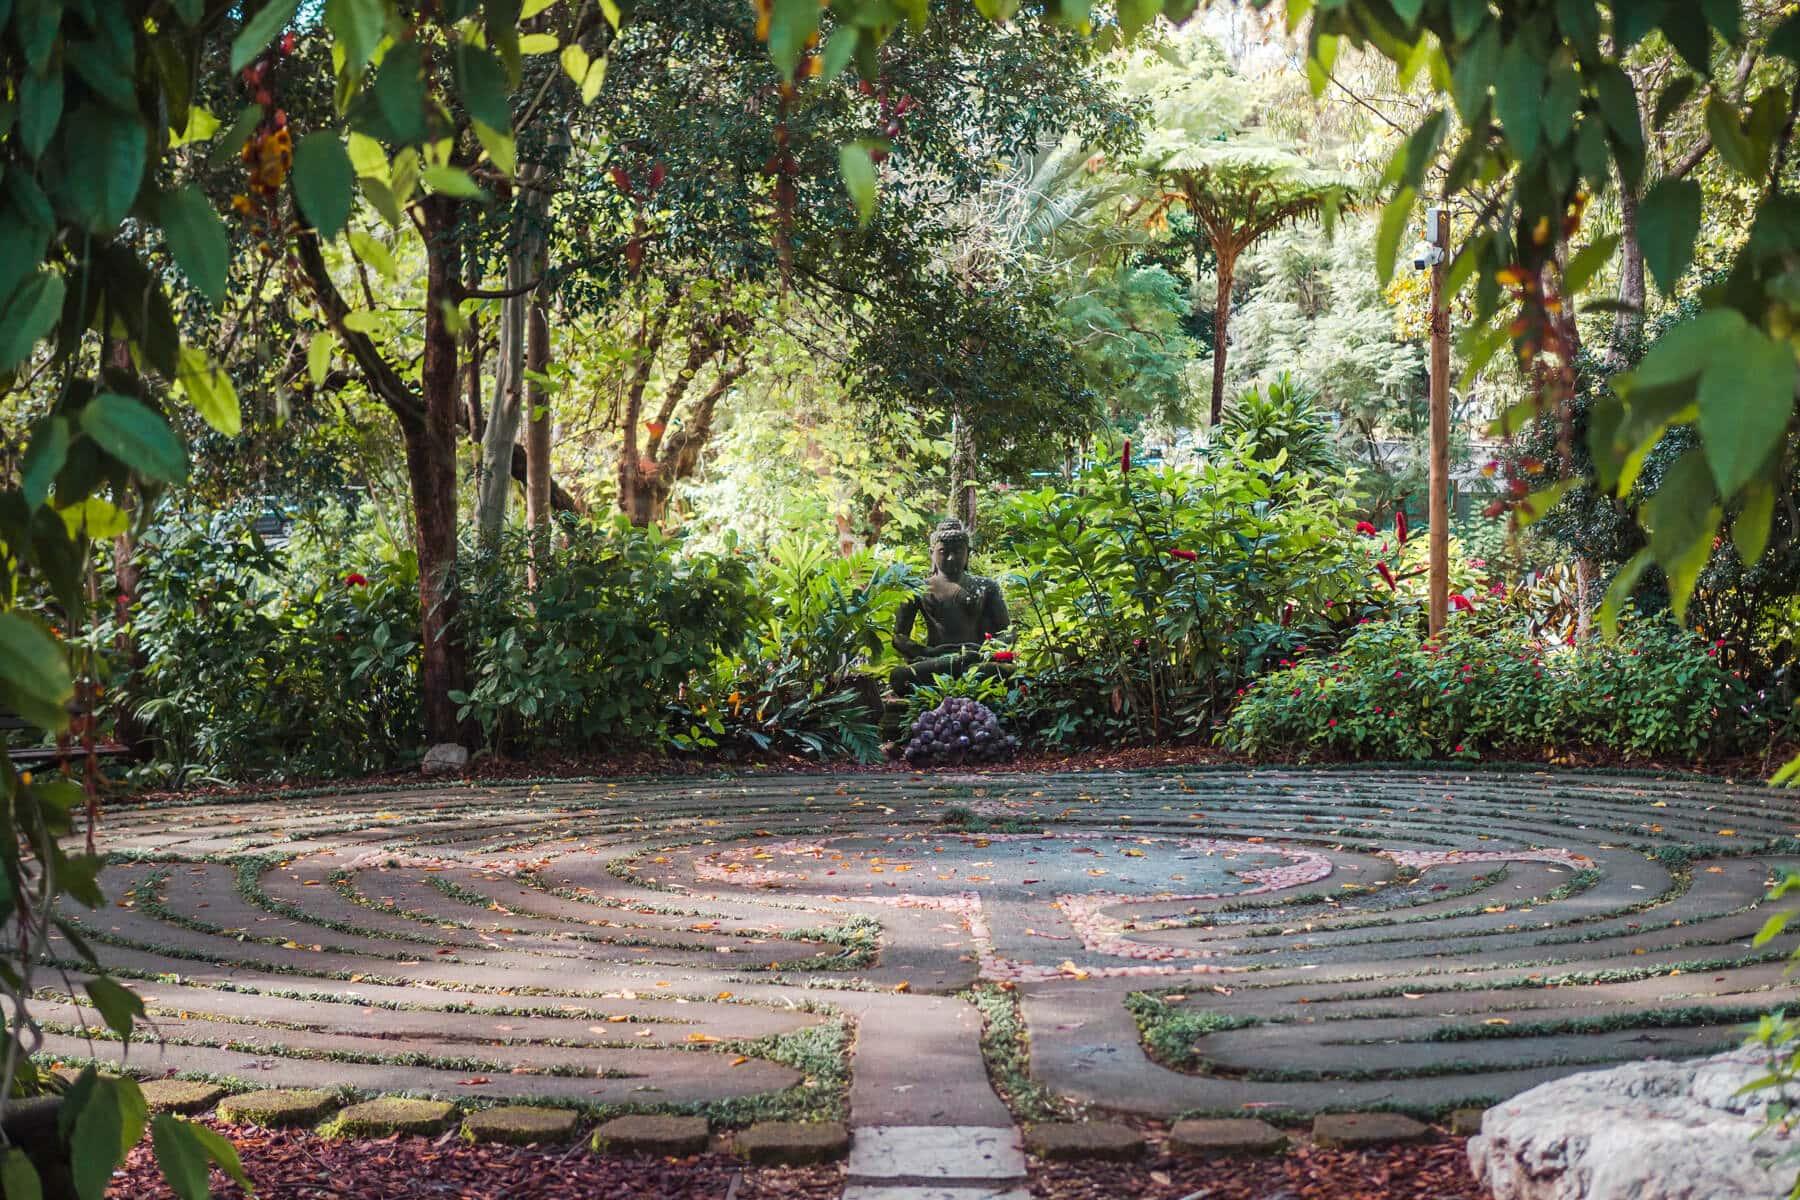 The incredibly stunning Crystal Castle & shambhala Gardens located in the Byron Bay hinterland, NSW Australia - Labyrinth reflection walk